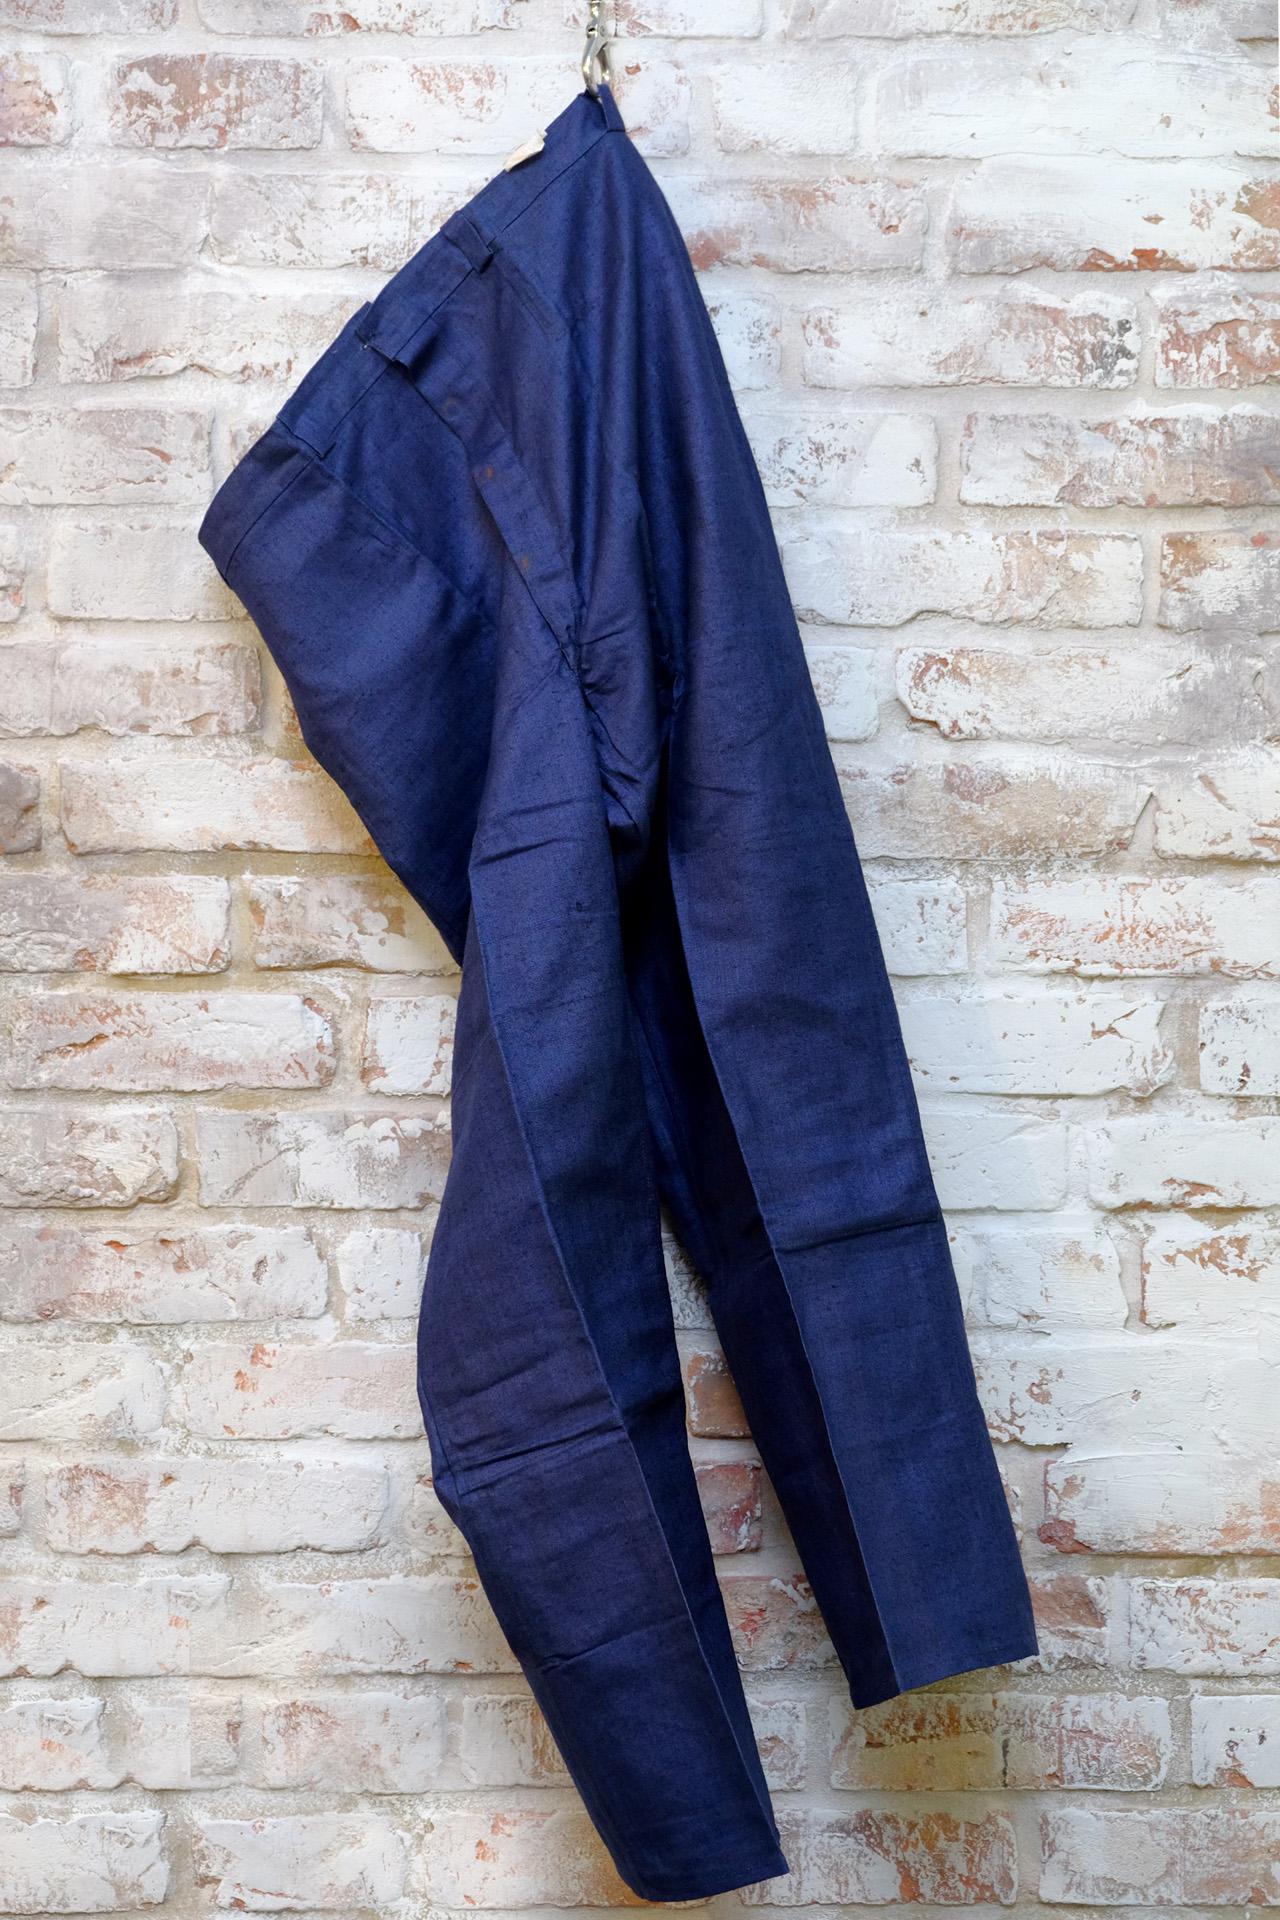 arbeitshose blau dead stock hose indigo leinen vintage ein seltenes teil uwe van. Black Bedroom Furniture Sets. Home Design Ideas